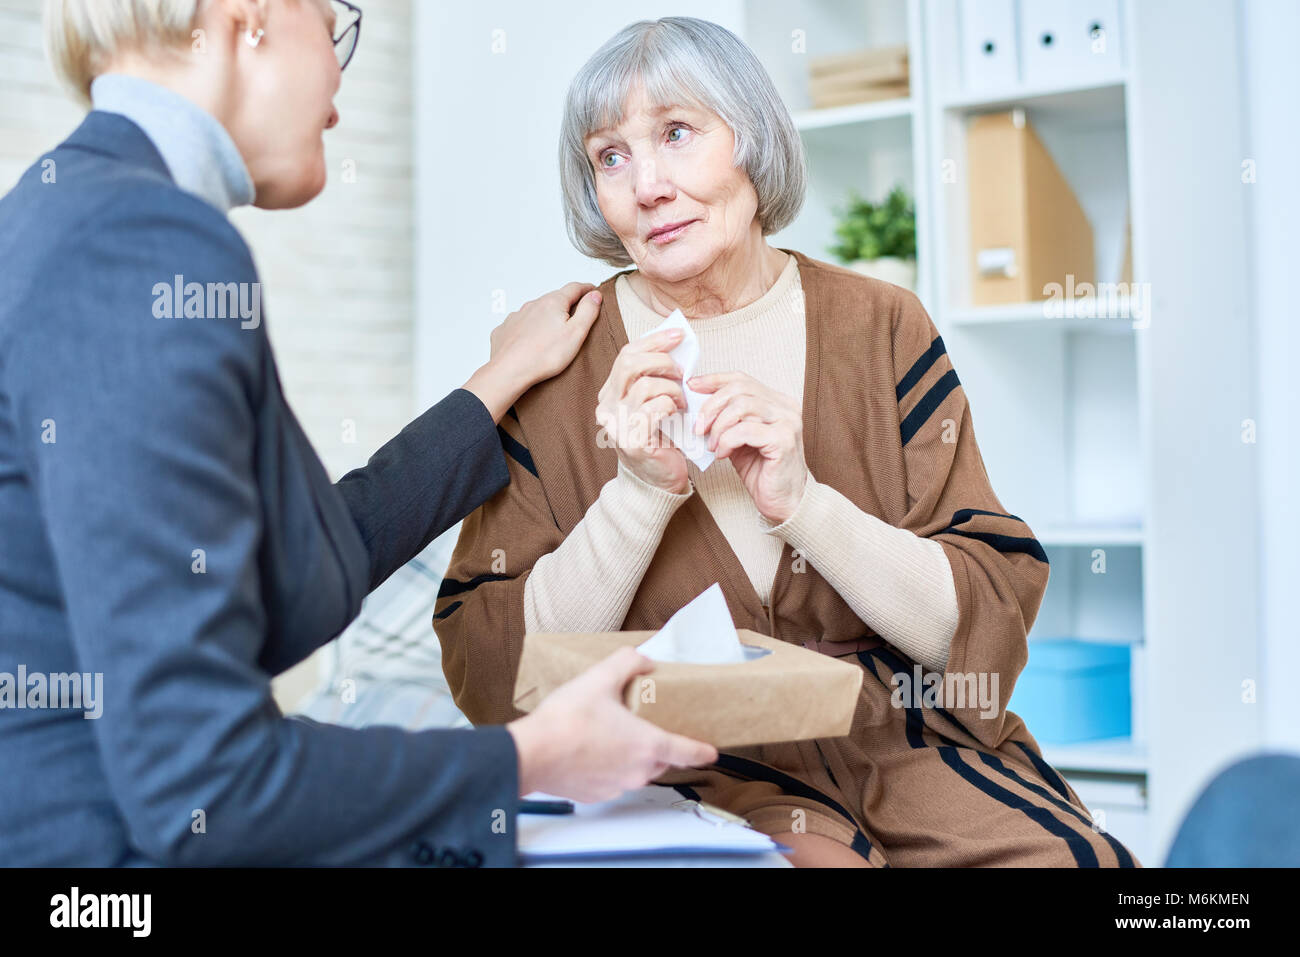 Crying Woman en thérapie Photo Stock